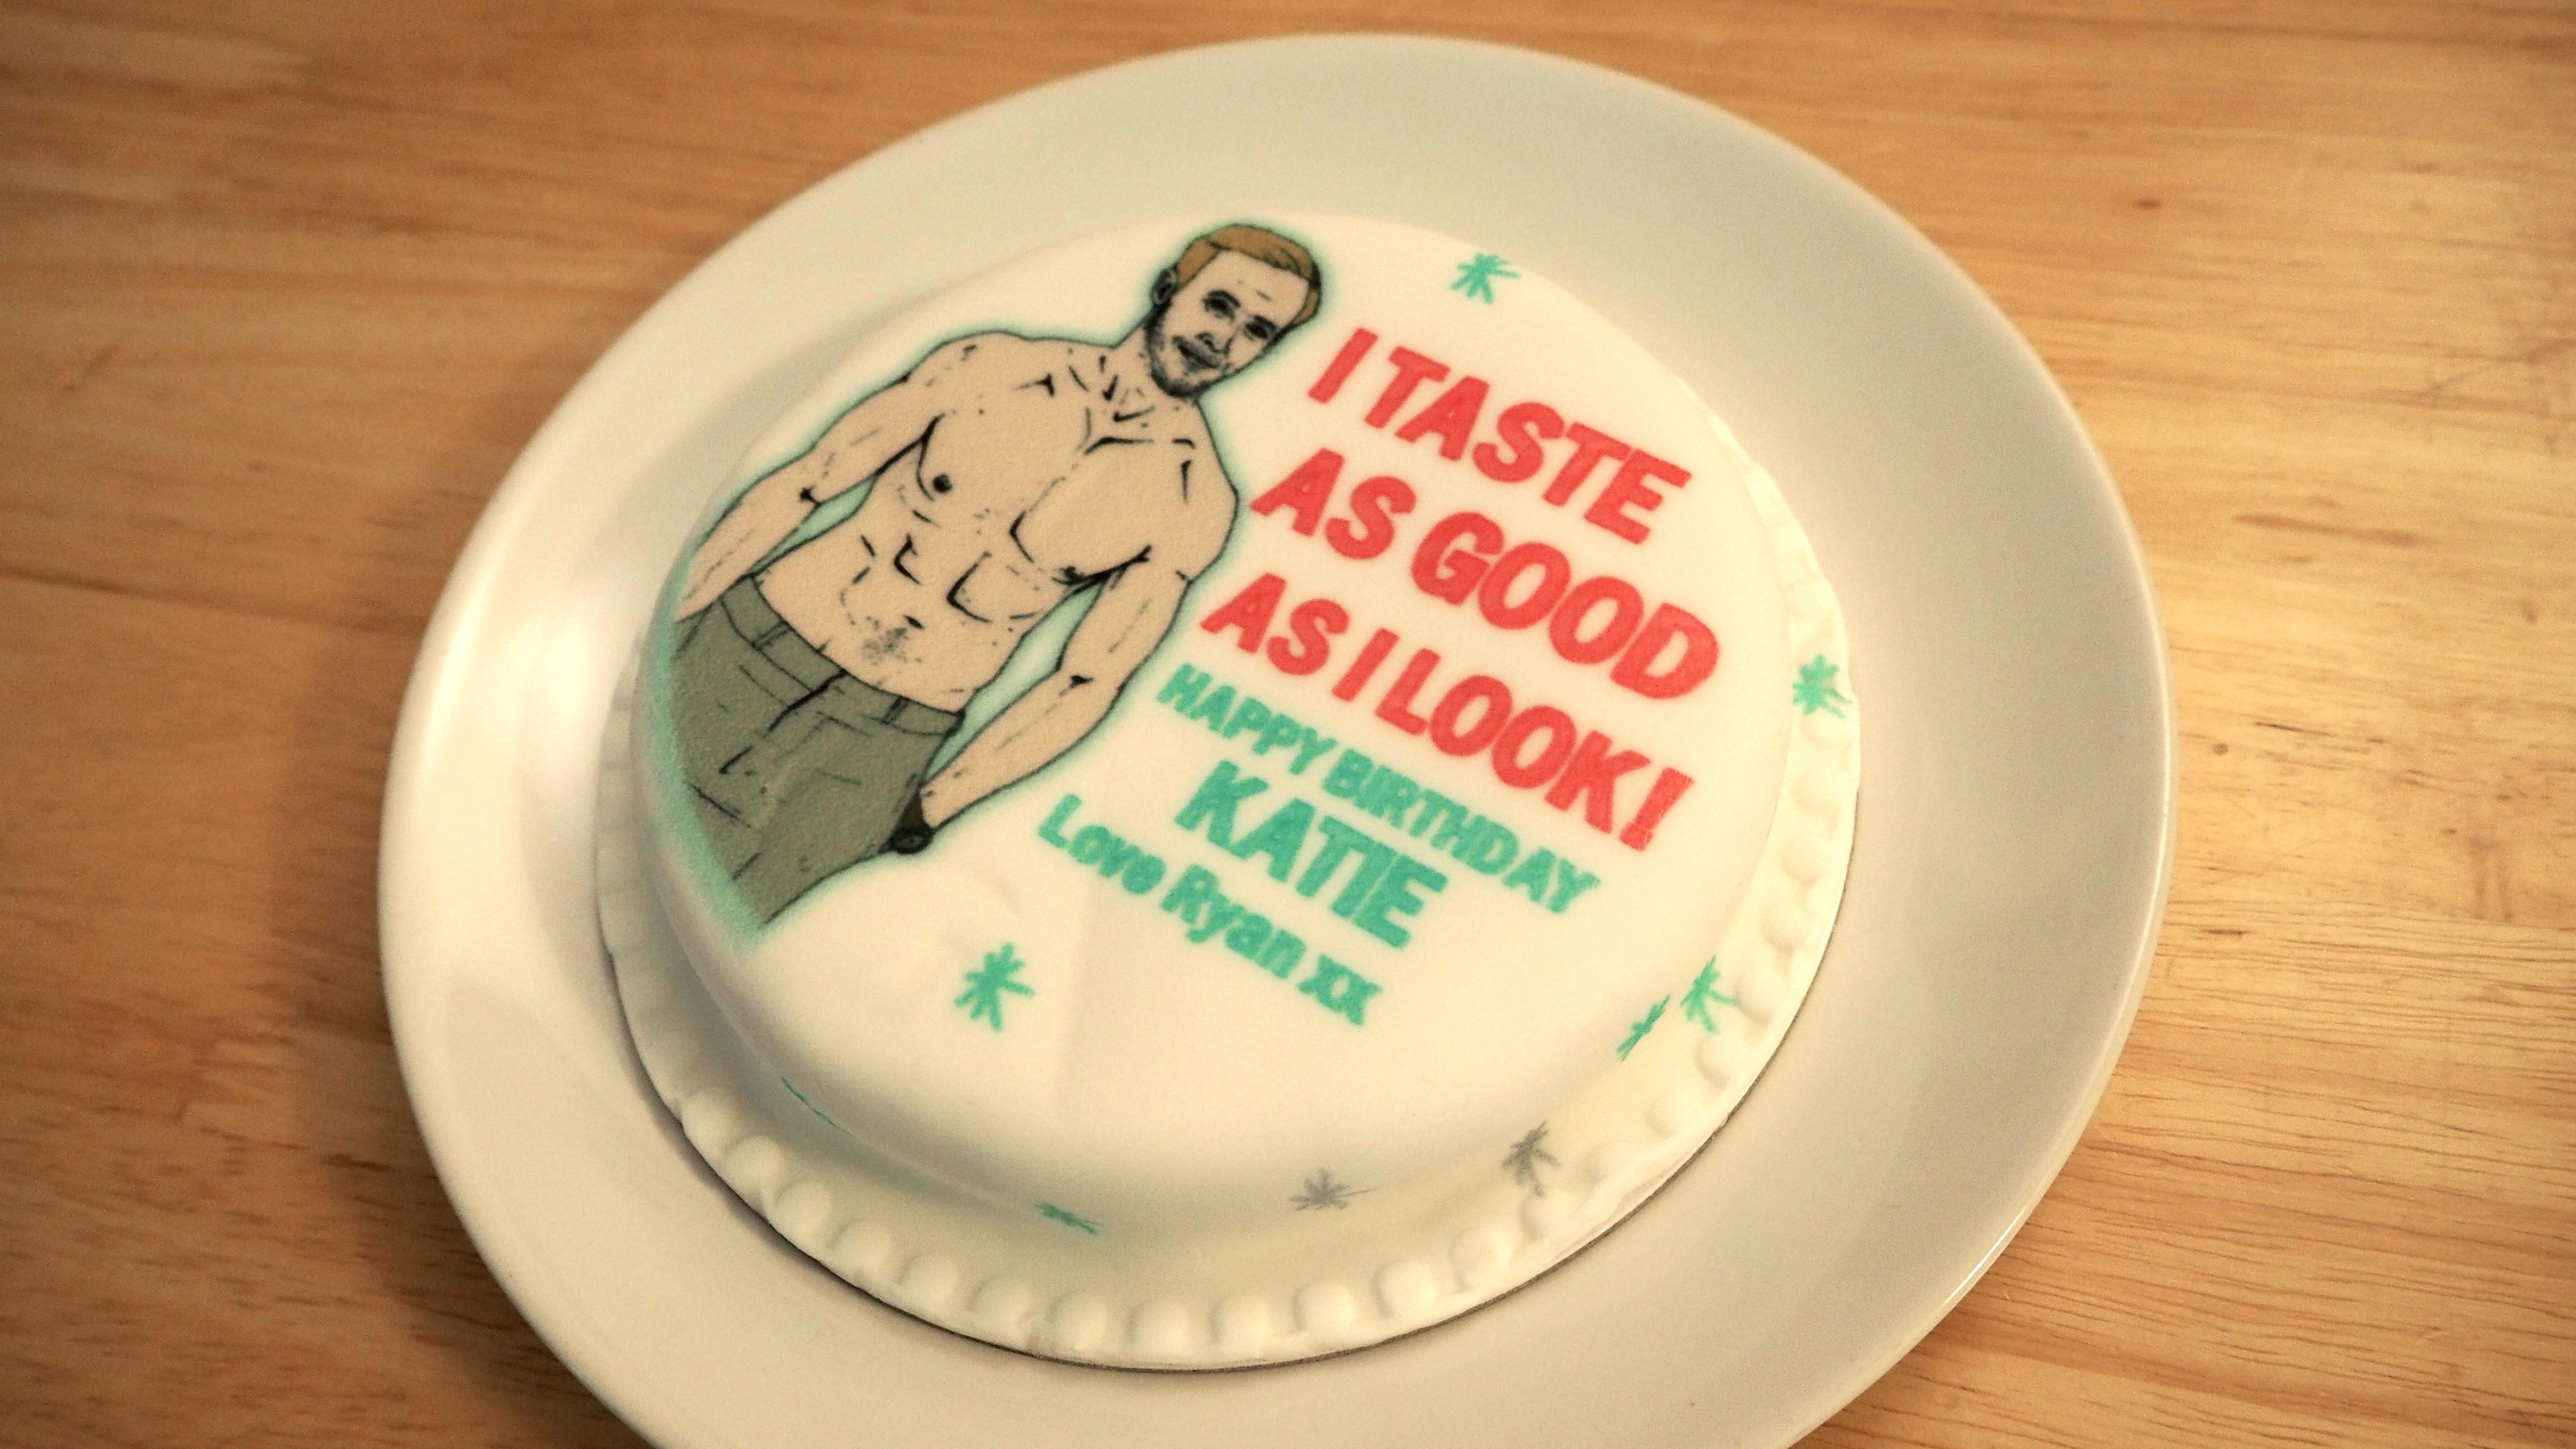 Ryna Gosling Baker Days cake